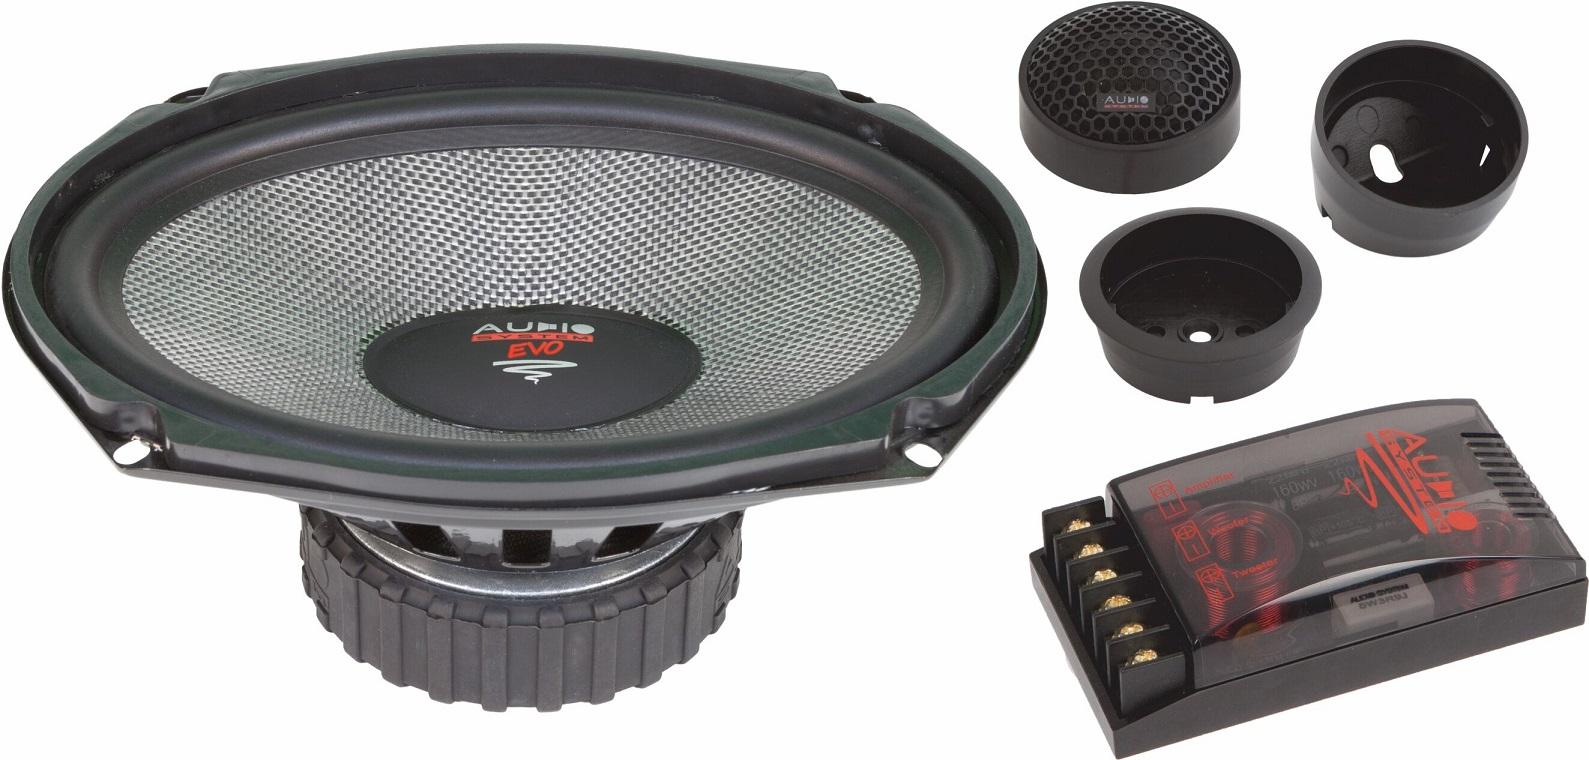 Audio System R 609 EVO RADION-SERIES 2-Wege 6x9 Spezial System Lautsprecher Speaker